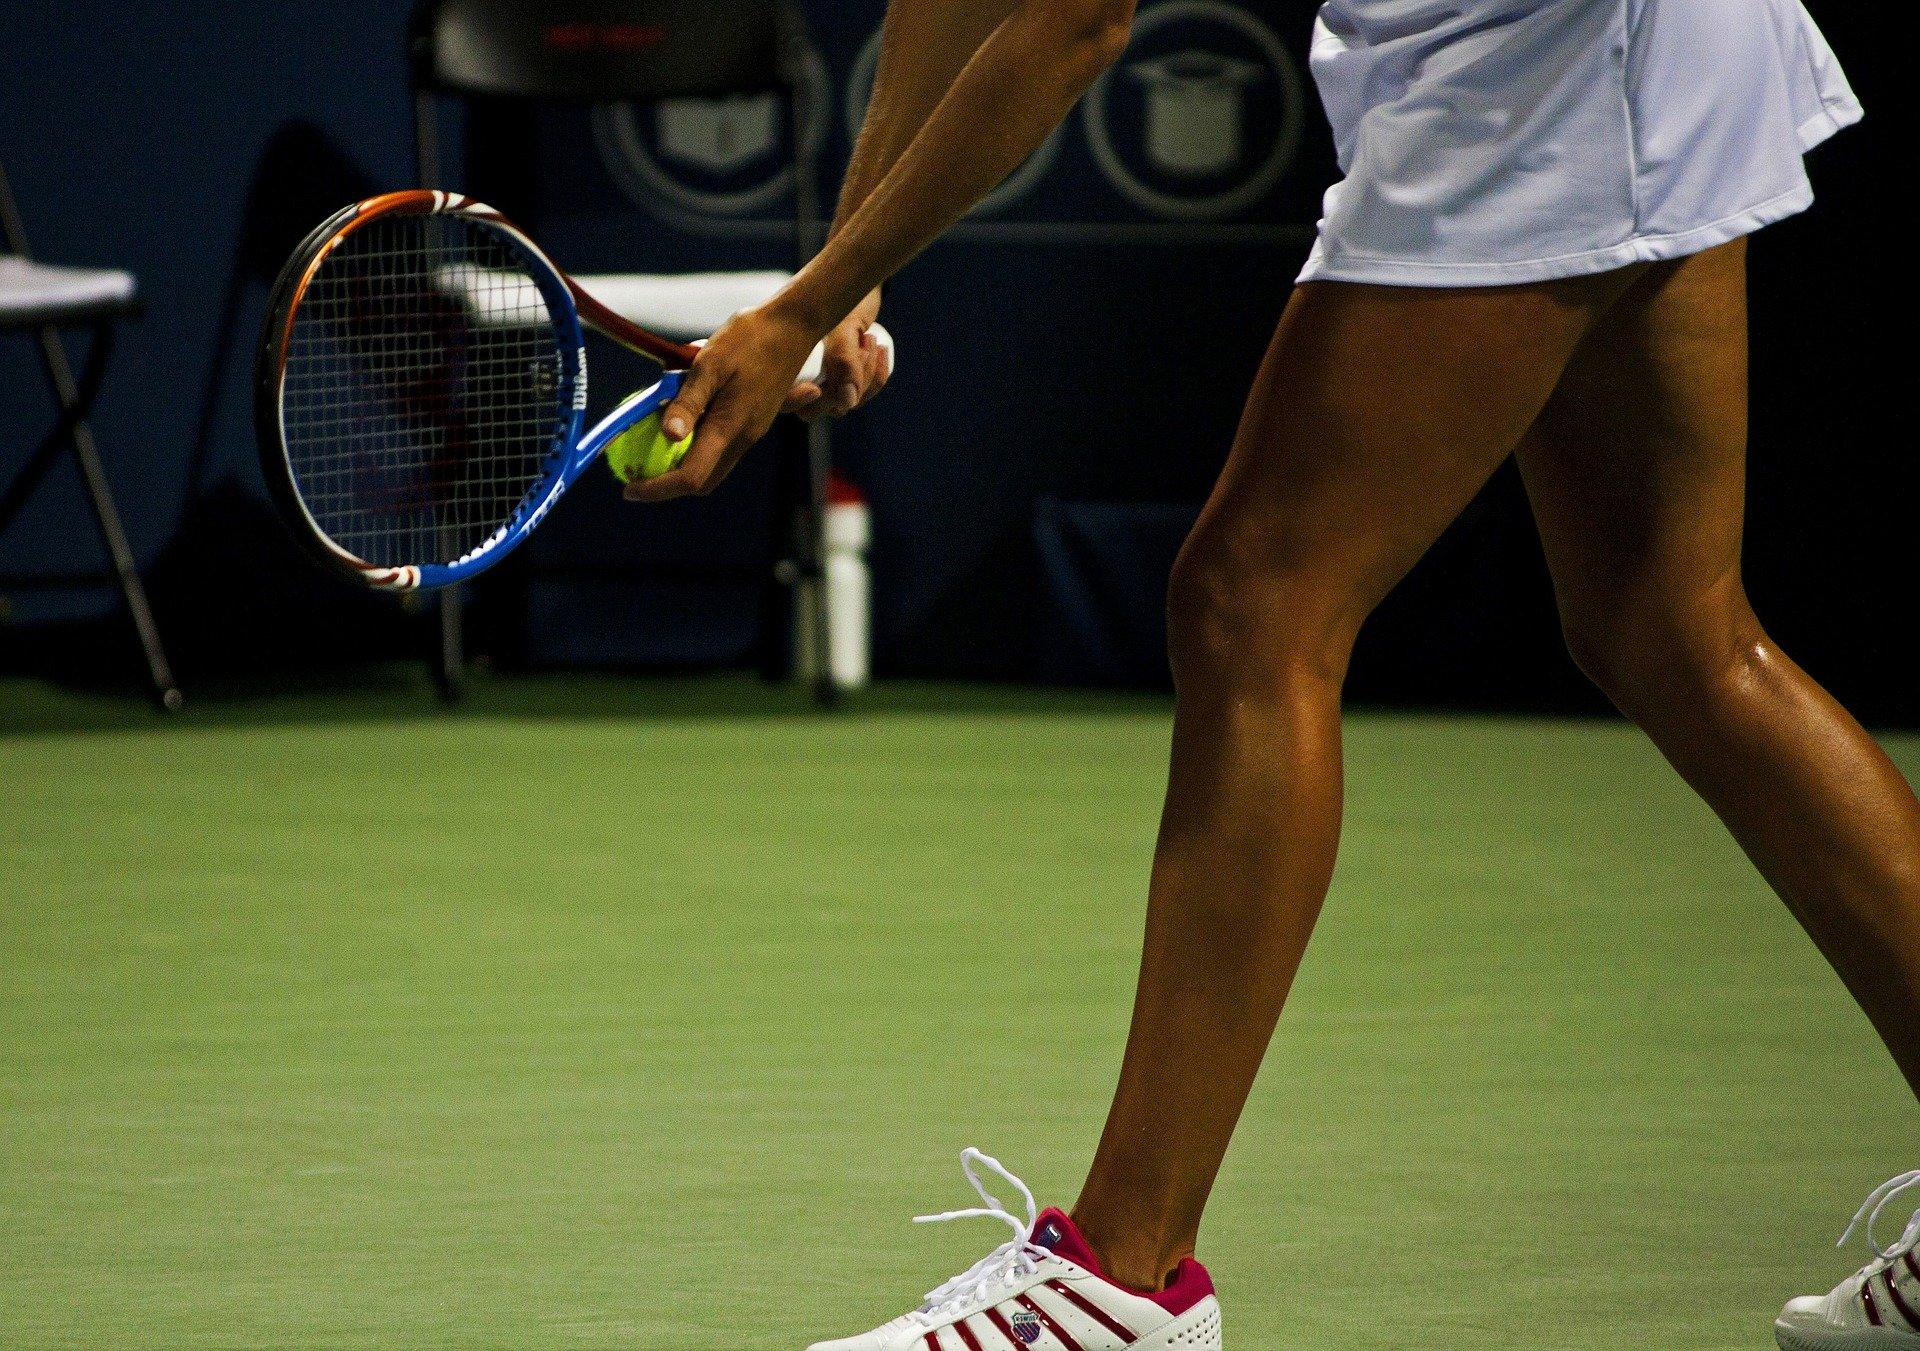 tennis player lines up serve